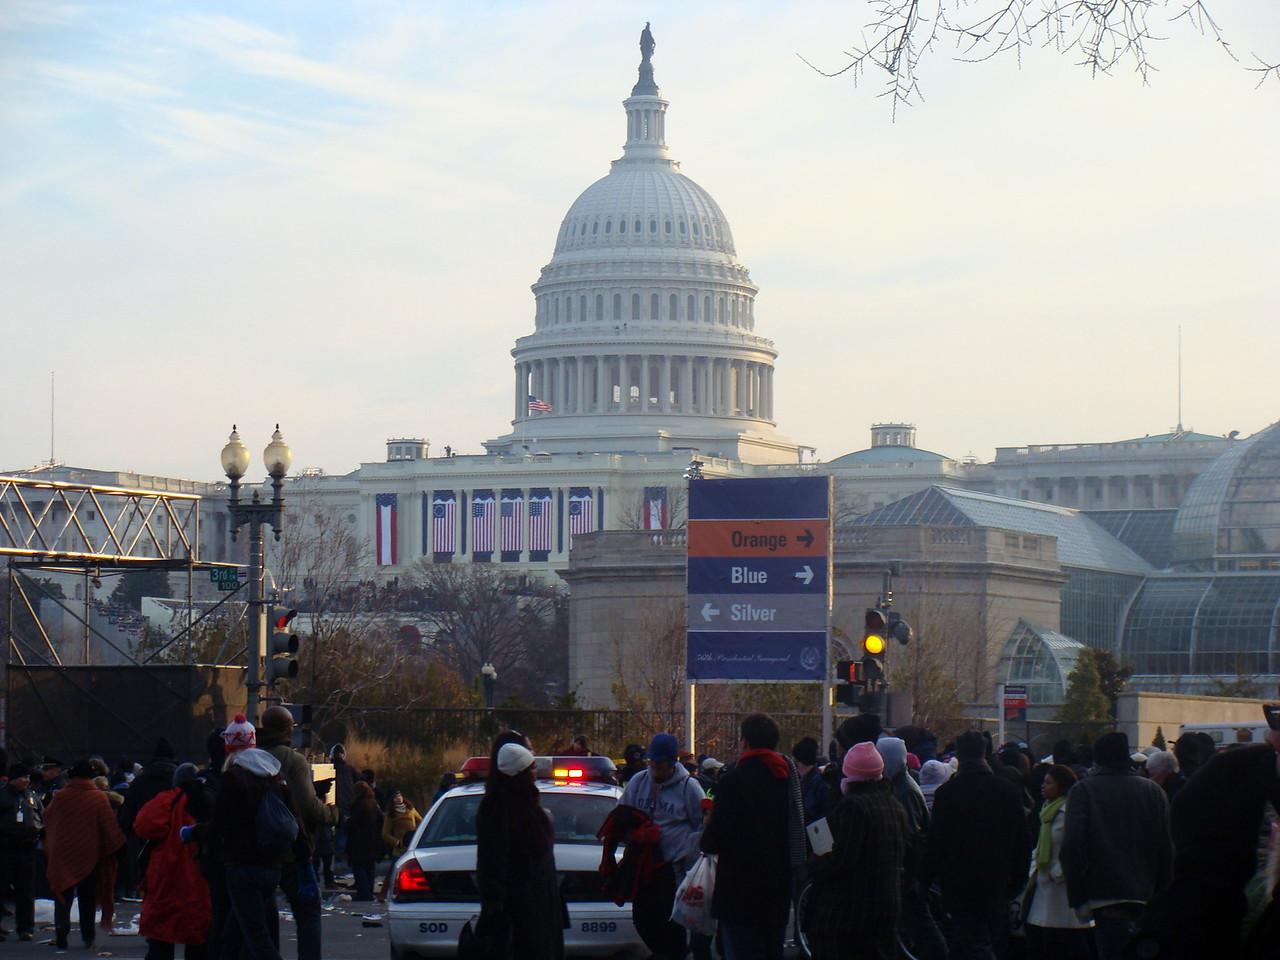 Inauguration Morning at the Capitol